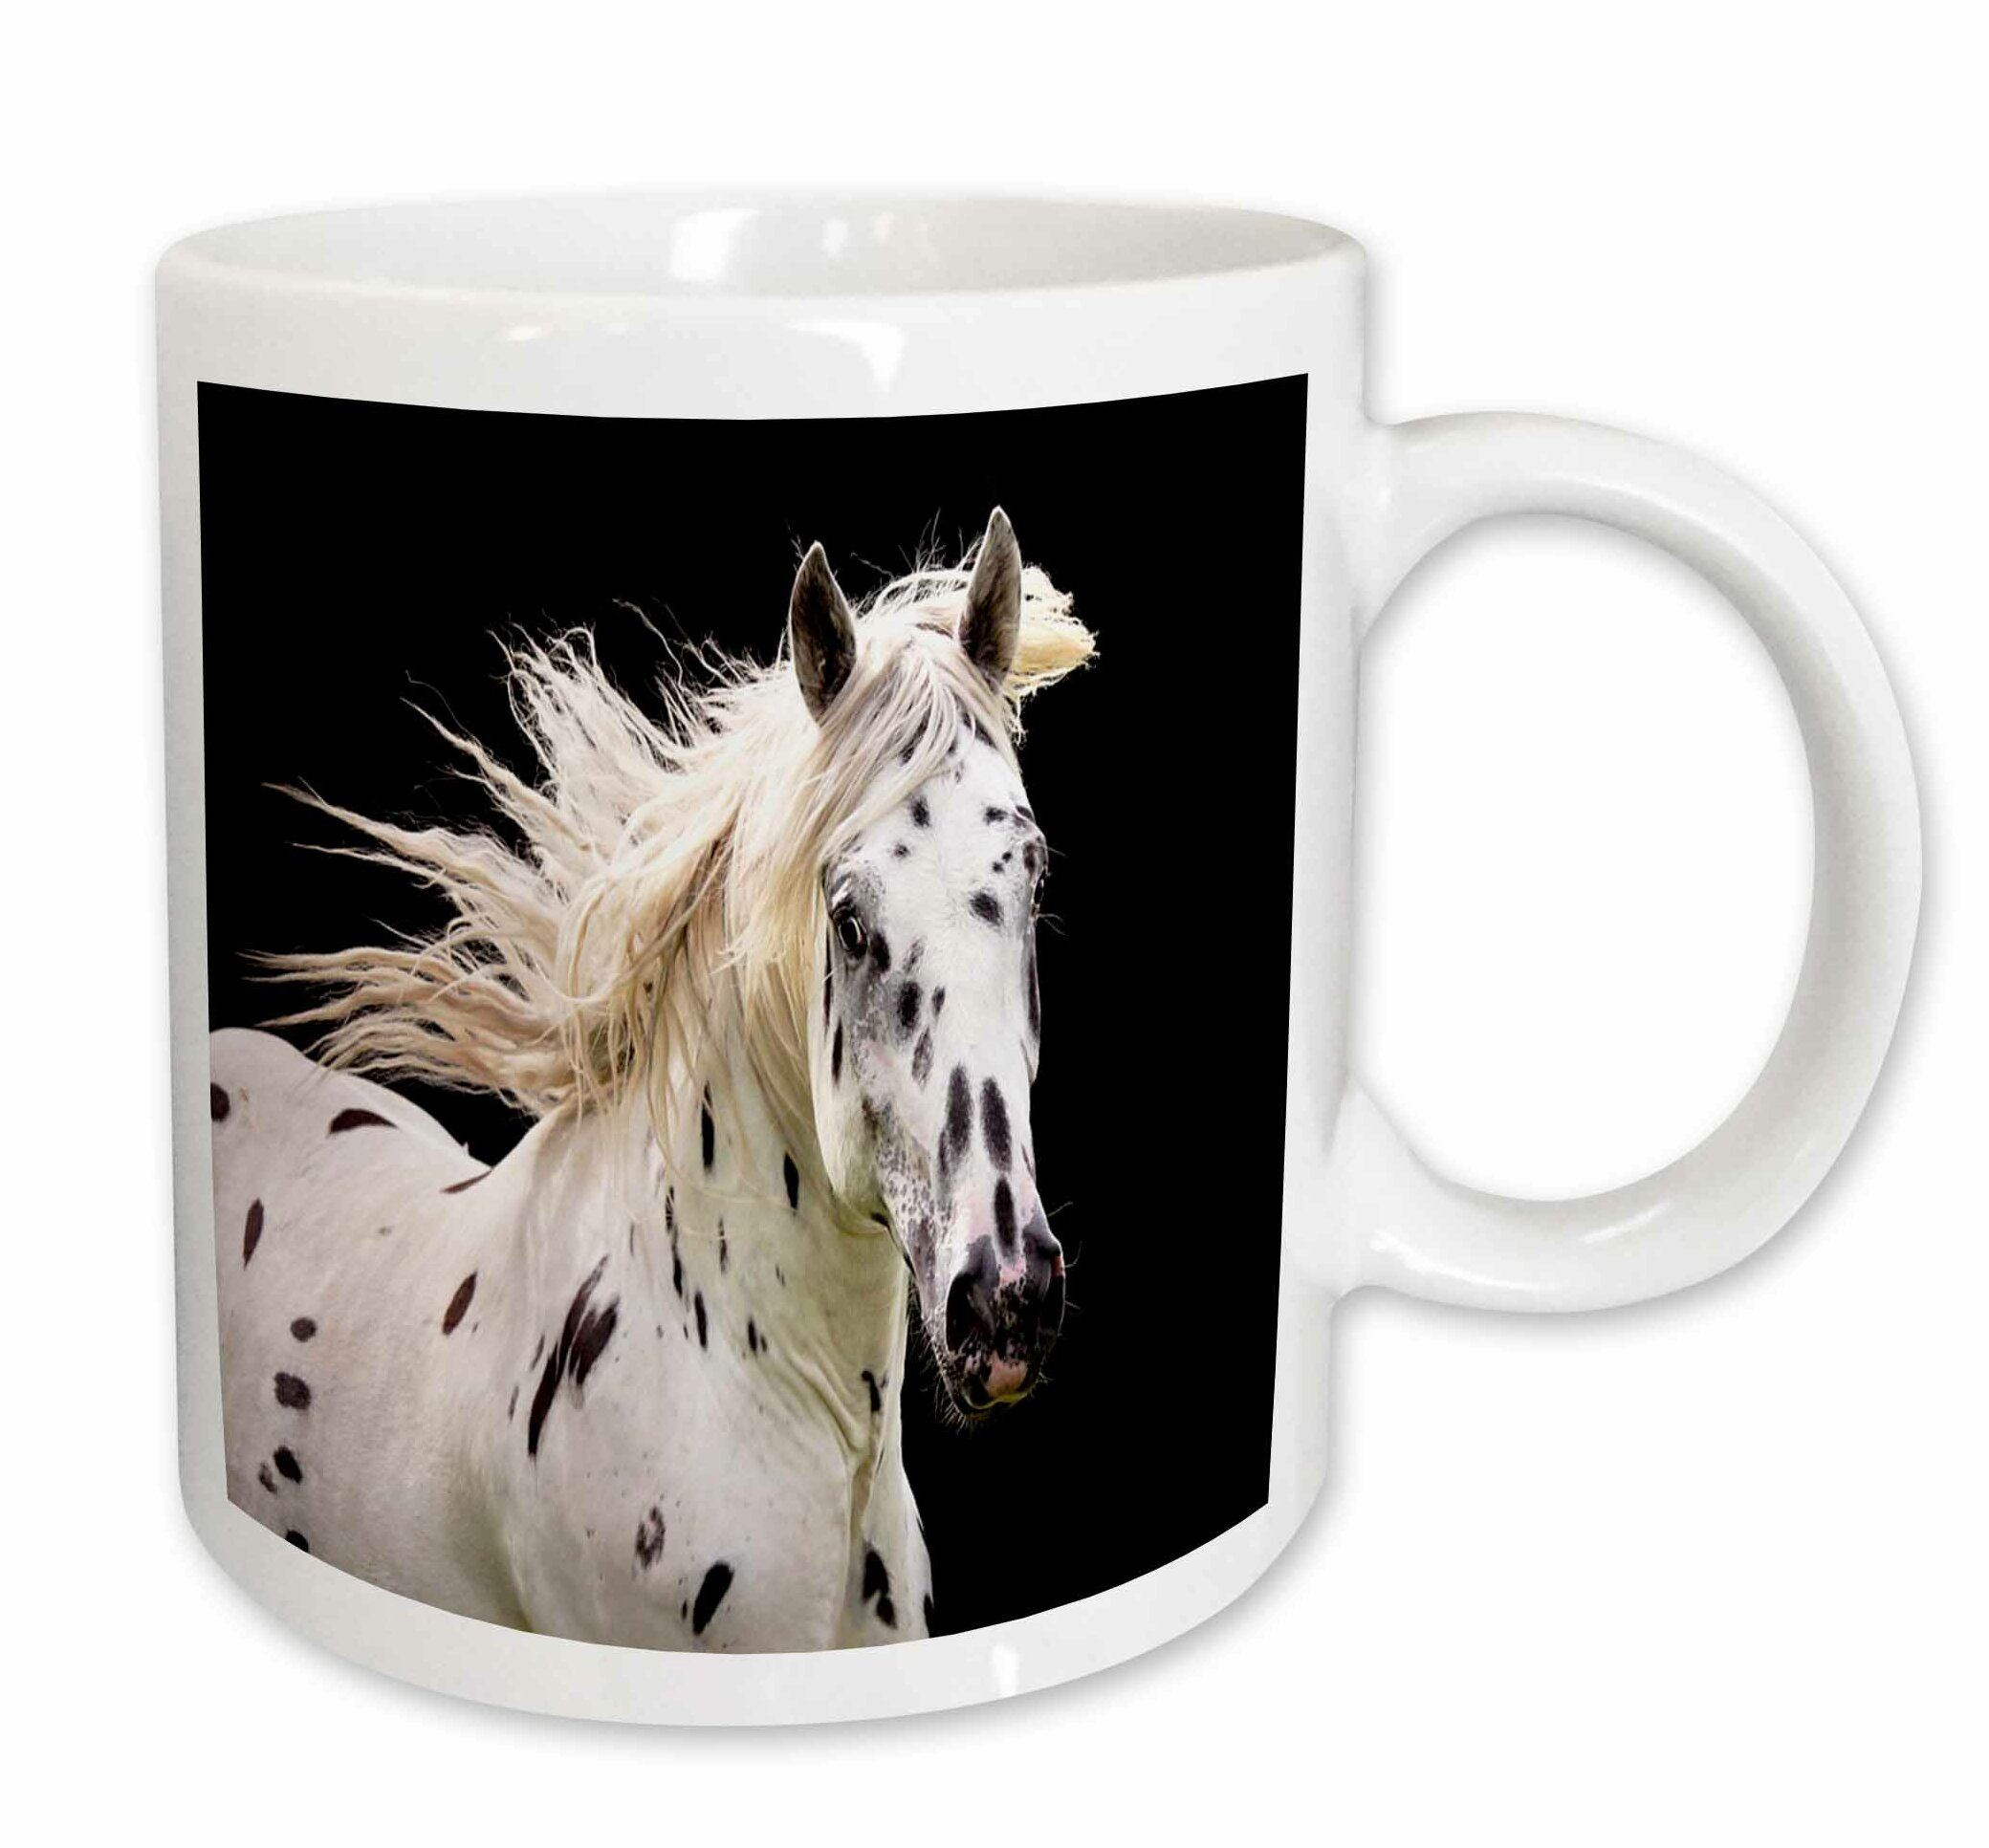 East Urban Home Beautiful Appaloosa Horse Coffee Mug